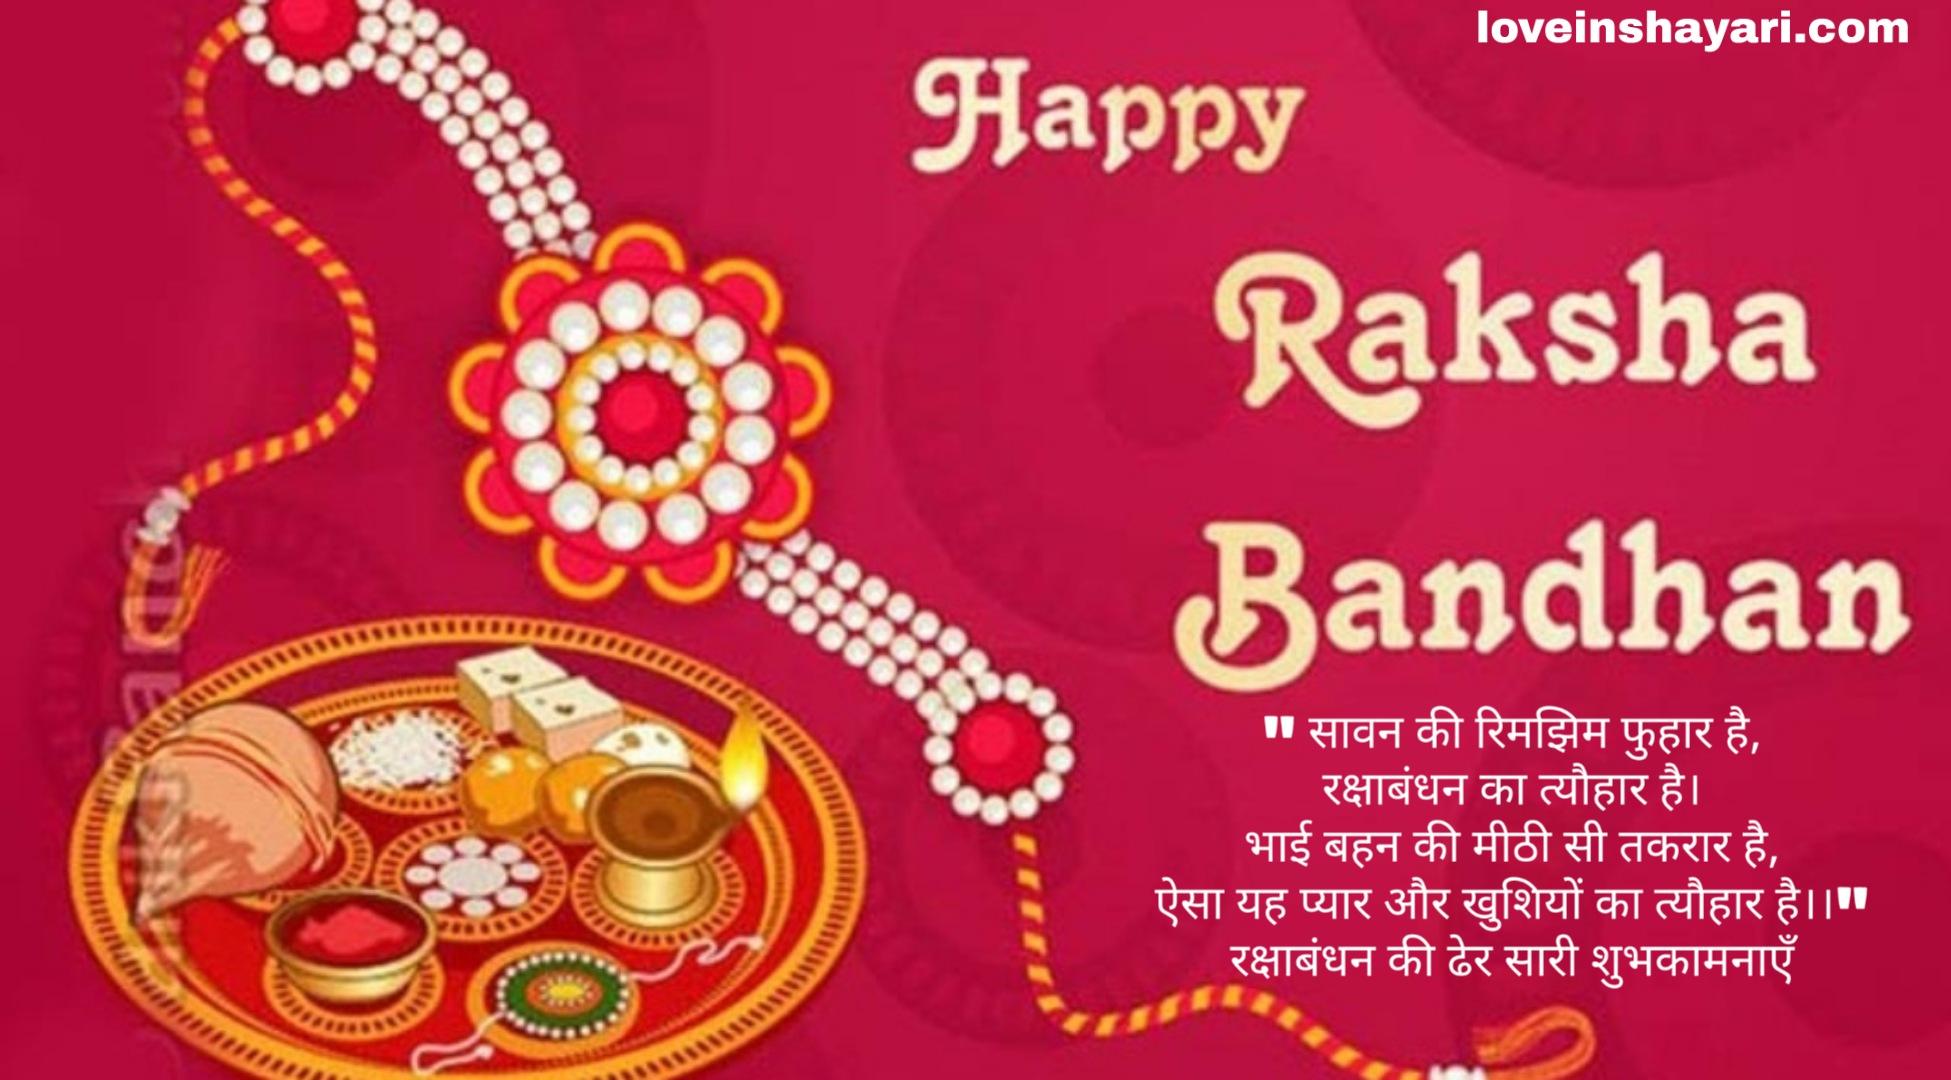 Rakshabandhan shayari wishes quotes messages